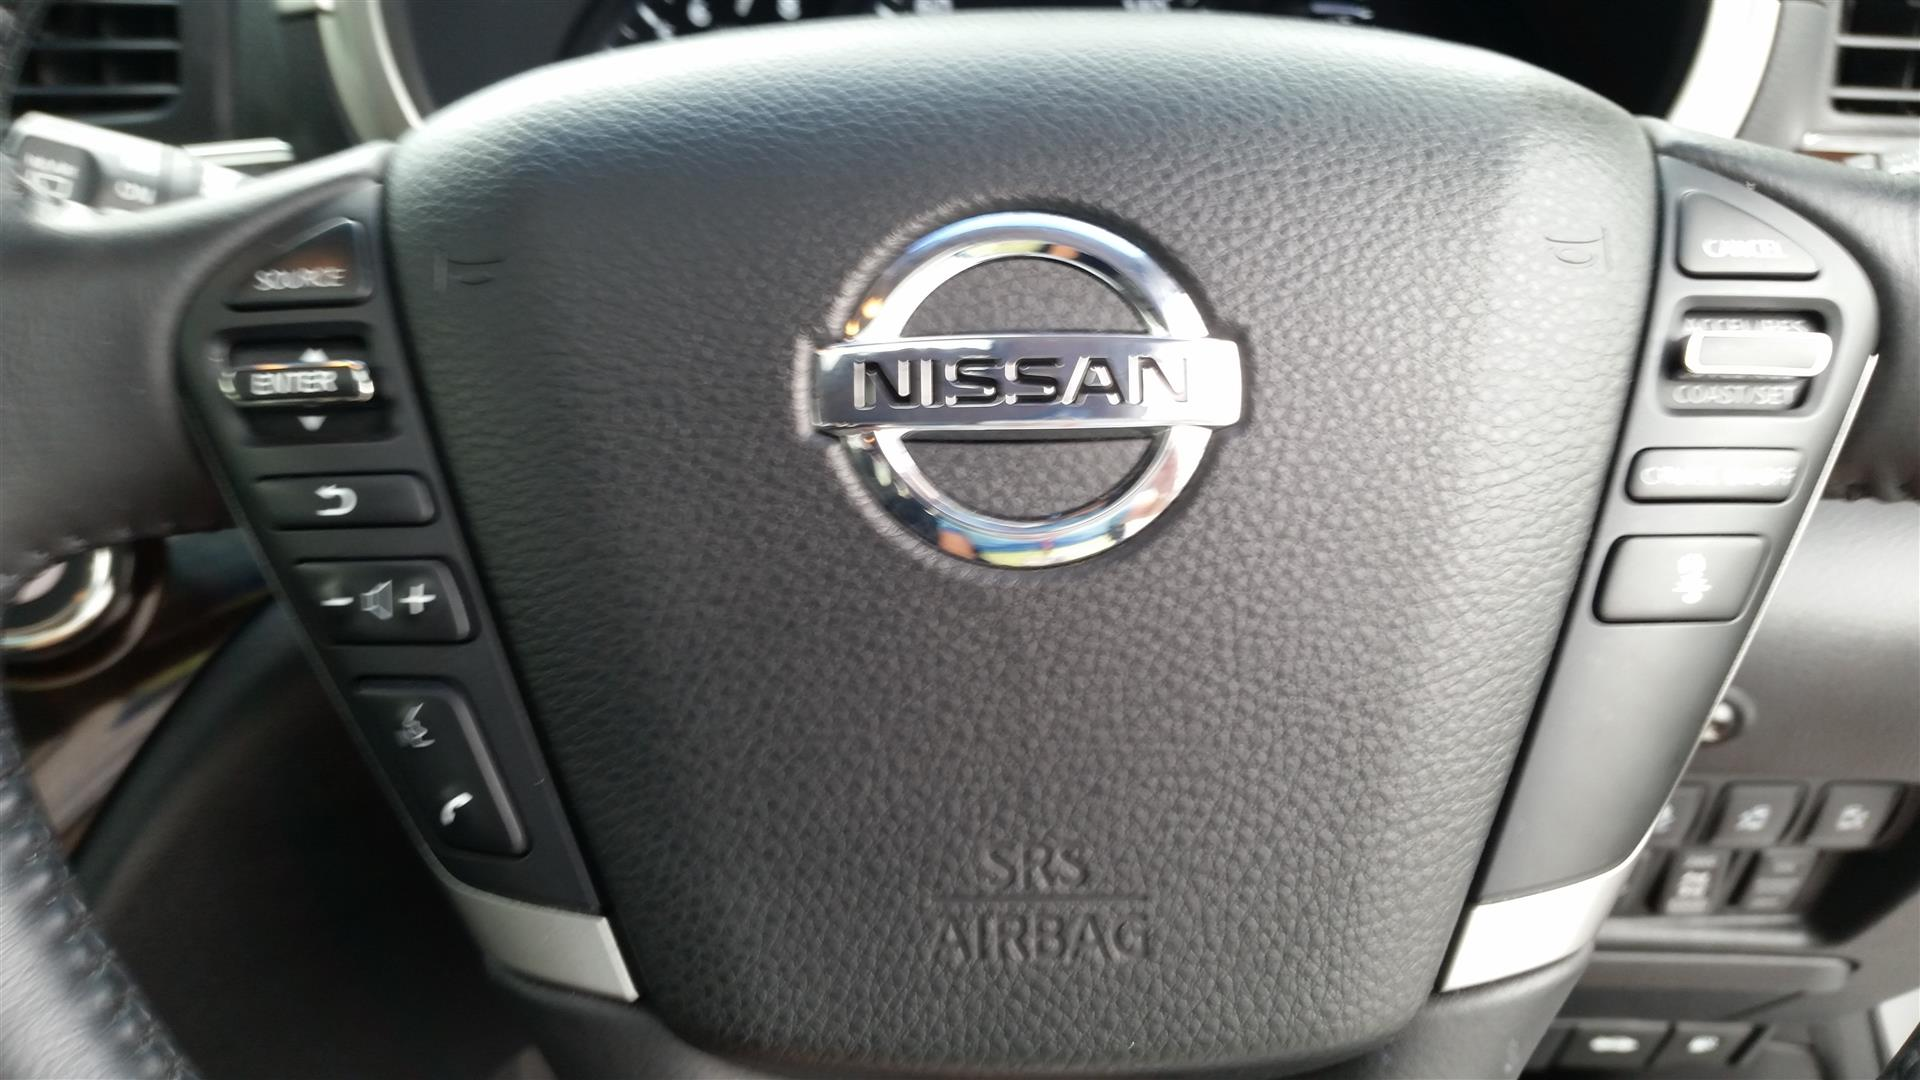 2012 Nissan Elgrand E52 20150627_143504 (Large)